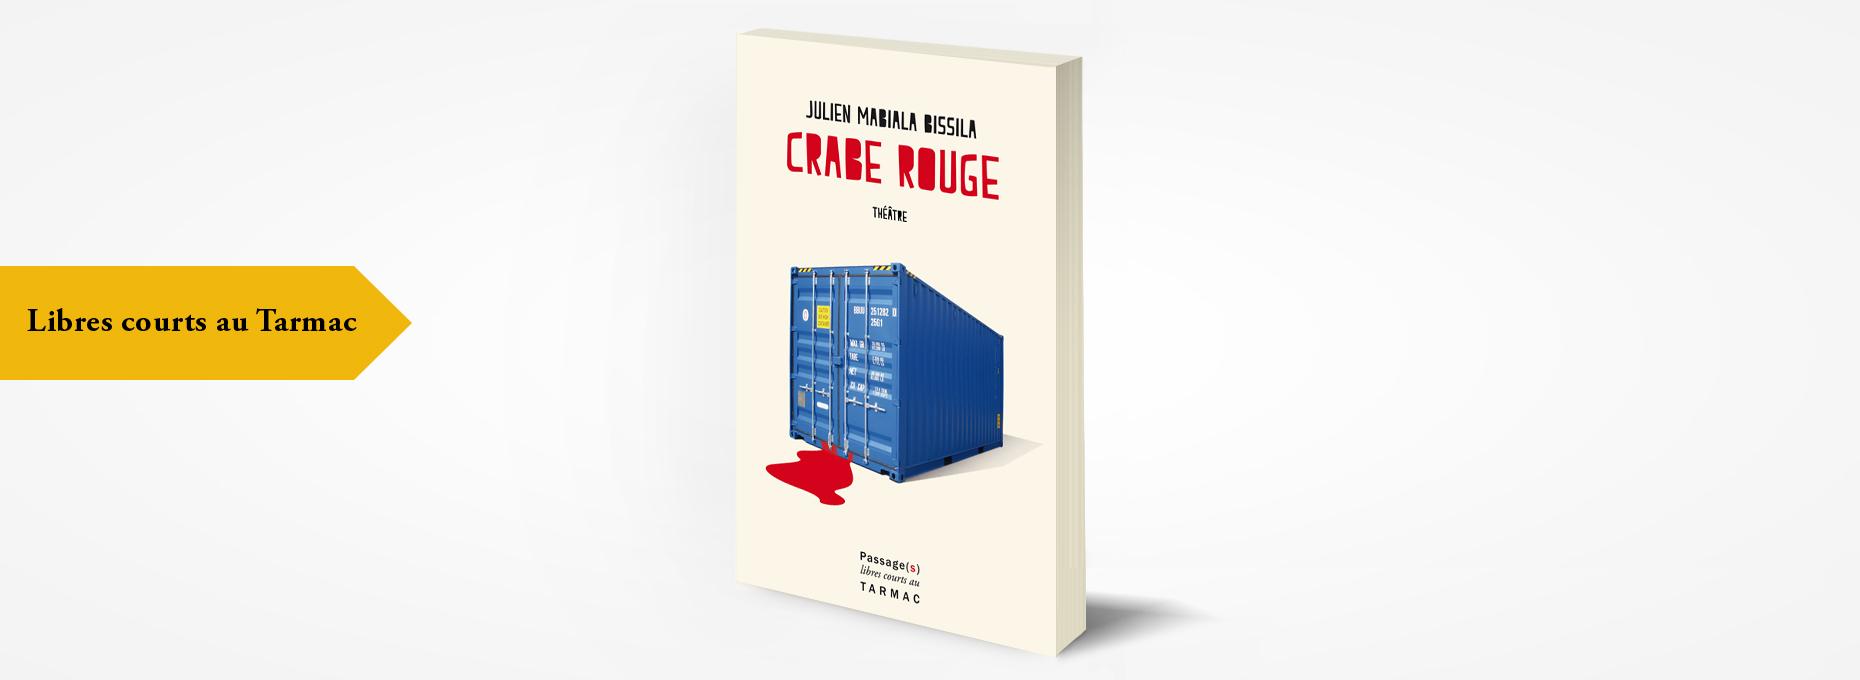 editions passage s julien mabiala bissilacrabe rouge th tre. Black Bedroom Furniture Sets. Home Design Ideas